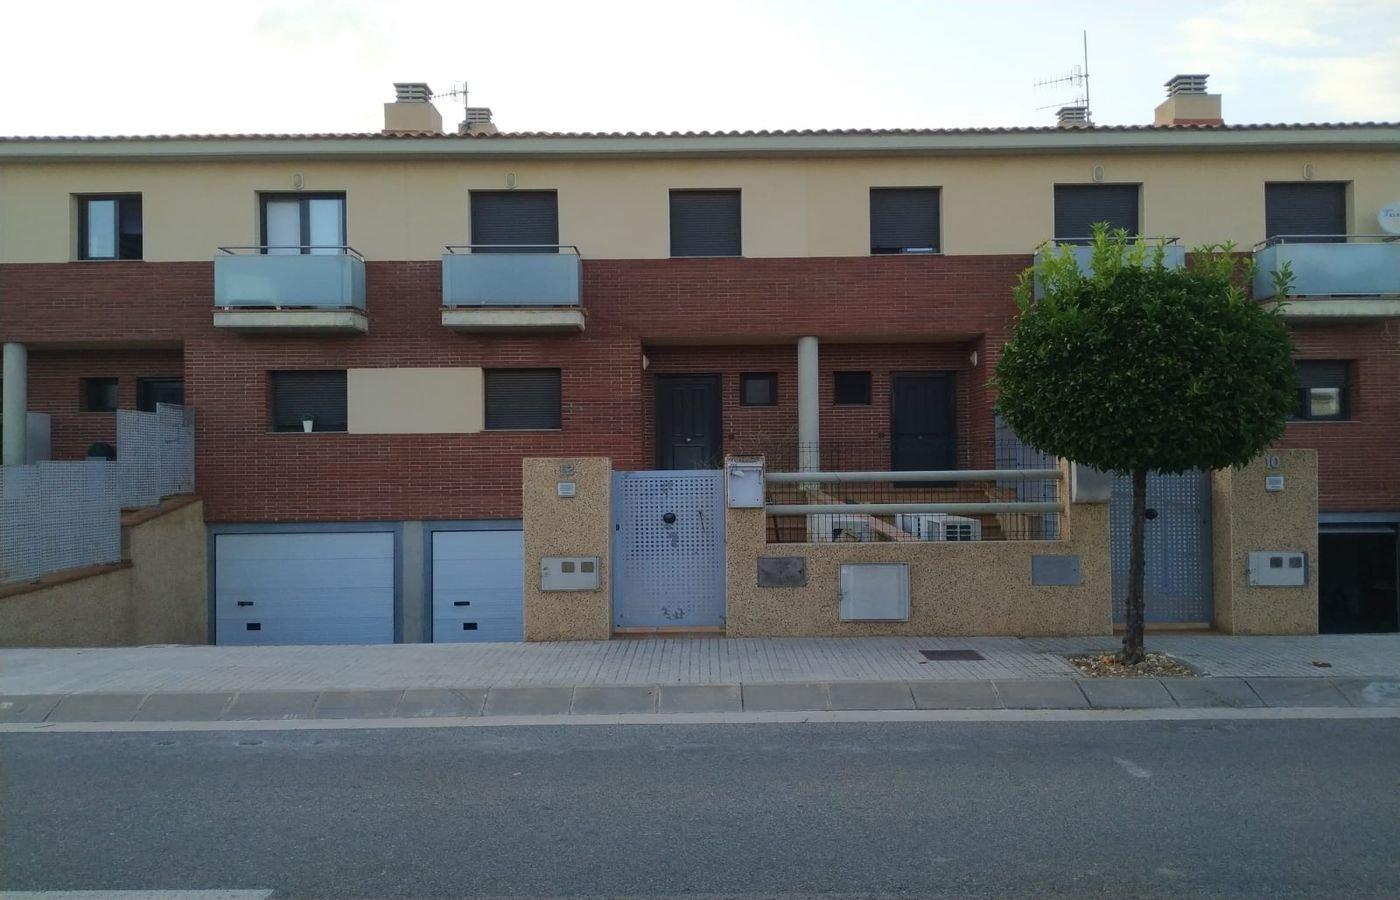 Townhouse for sale in CAP-ROIG, La Ampolla